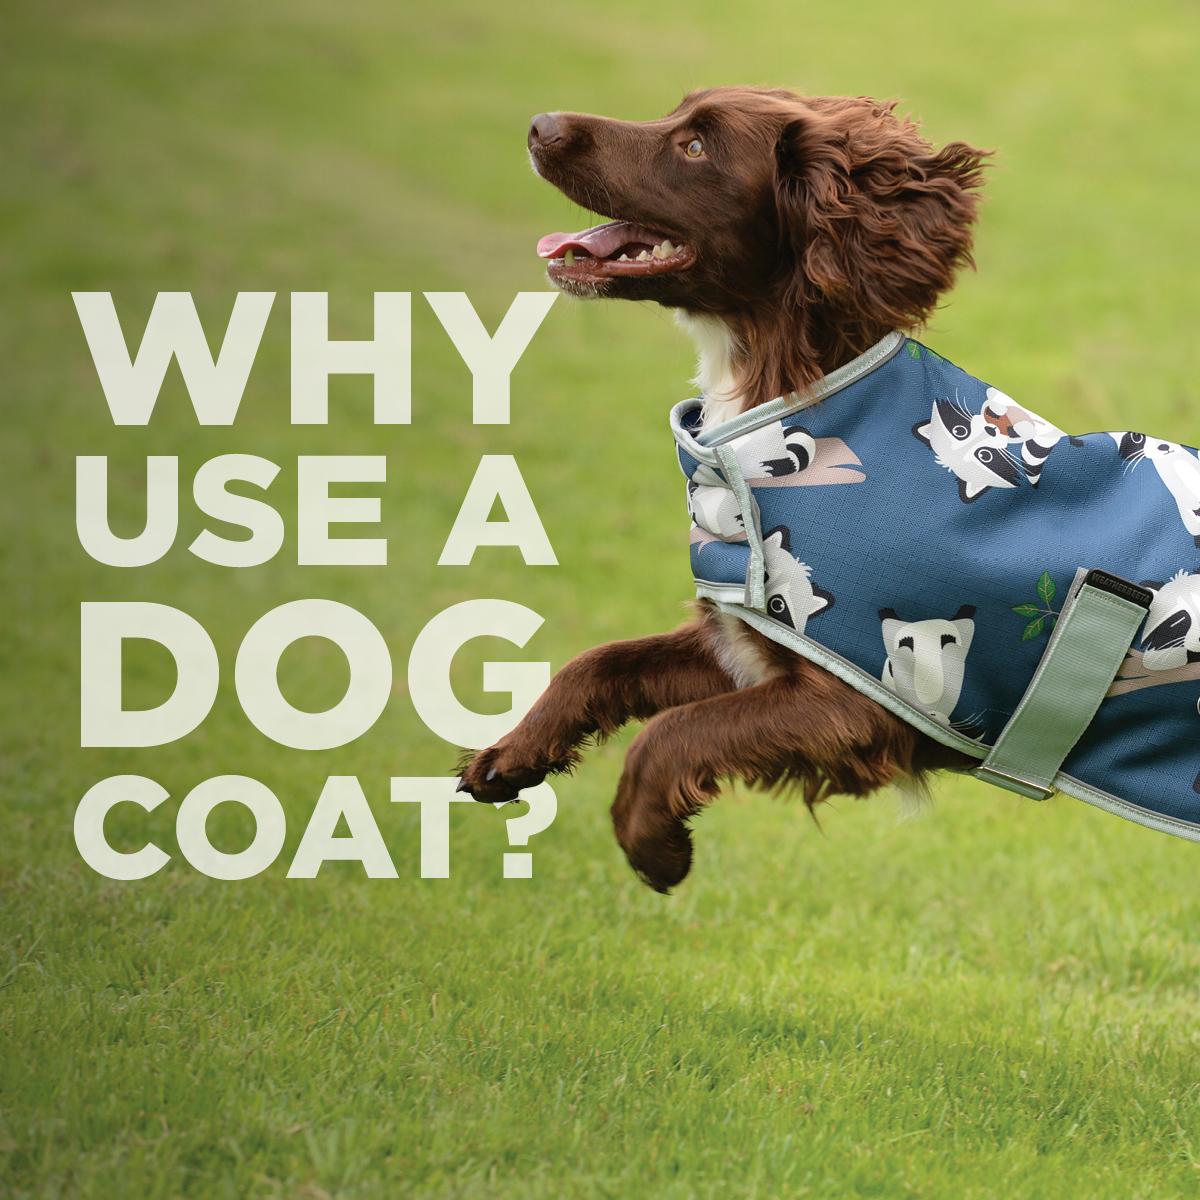 Why use a dog coat?